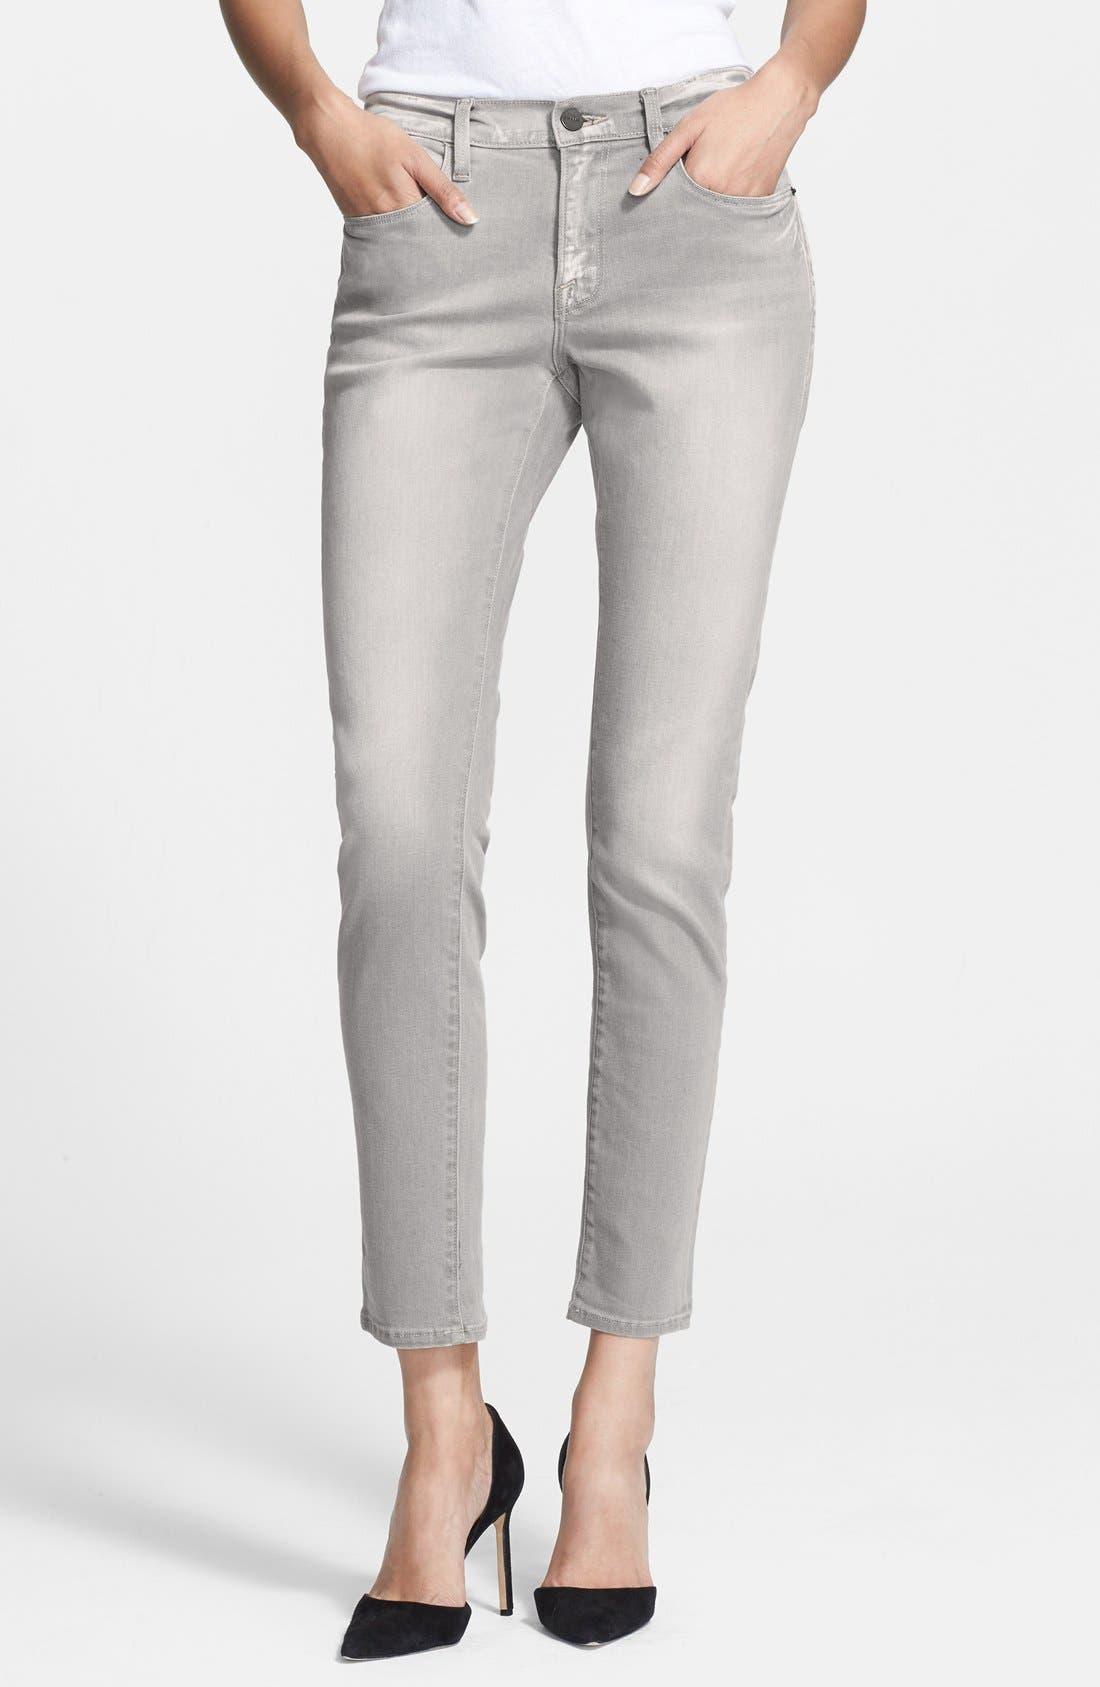 Main Image - Frame Denim 'Le Garcon' Slim Boyfriend Jeans (Kensington)